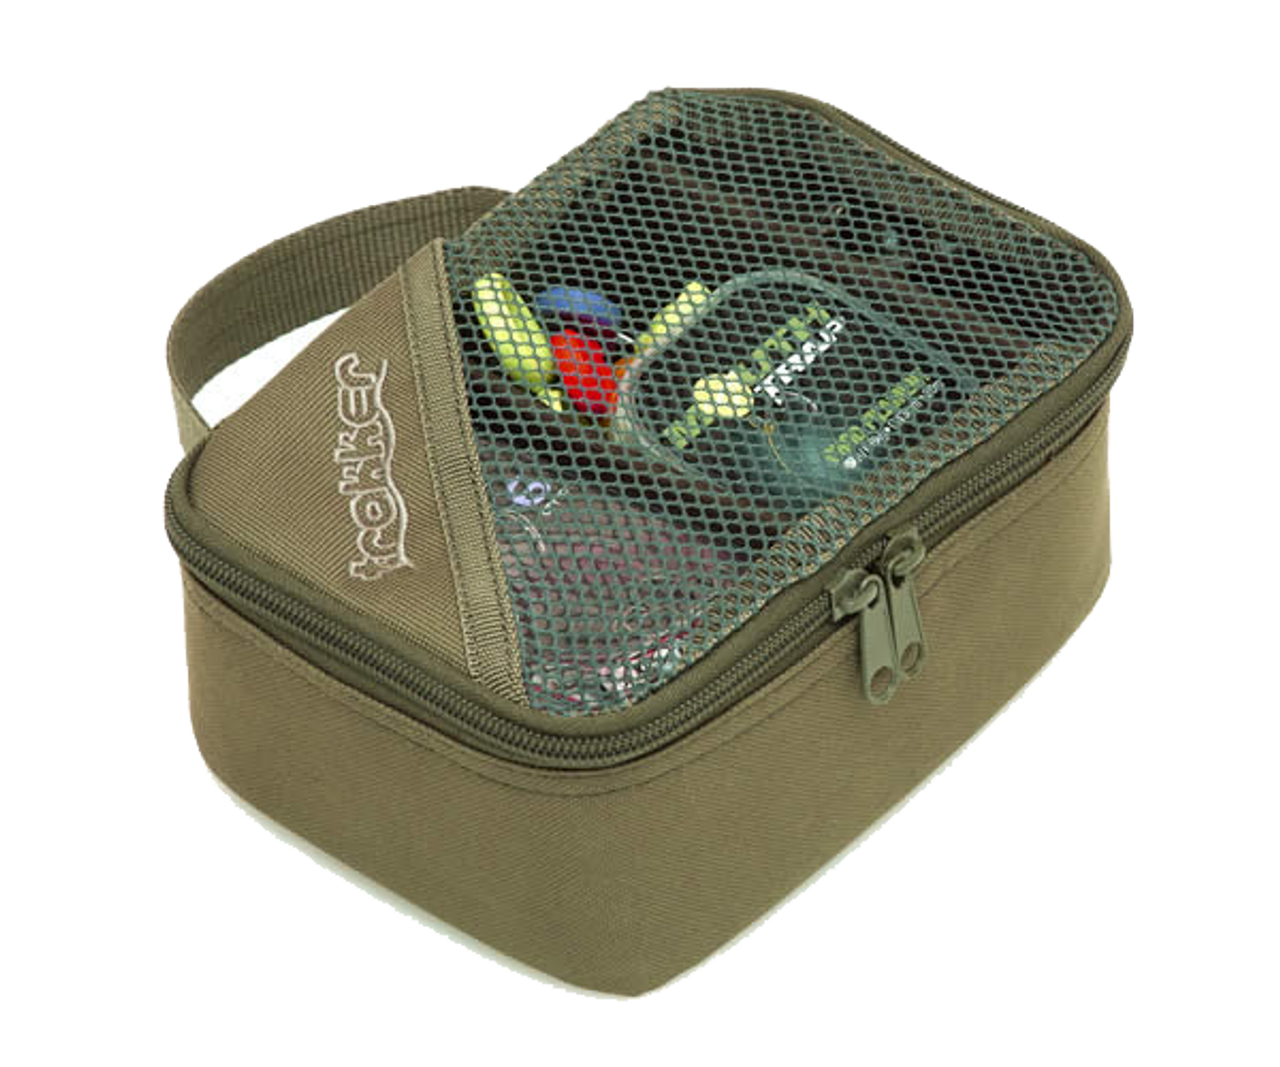 Trakker NXG Standard Bitz Bag